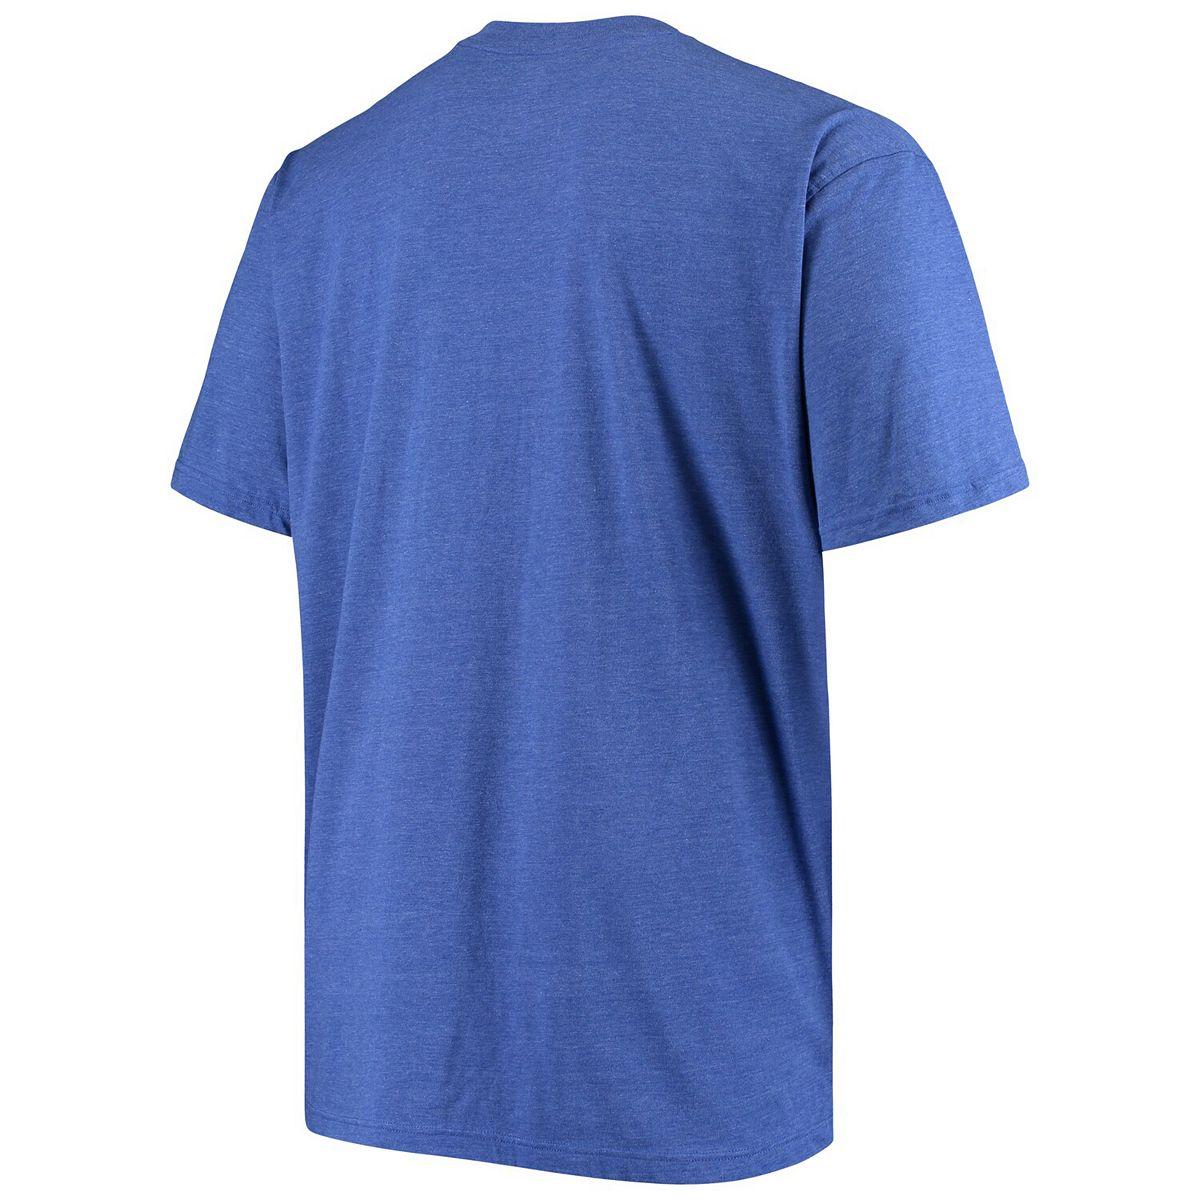 Men's Heathered Royal Kansas City Royals Distressed Team Logo Tri-Blend T-Shirt S2HYV